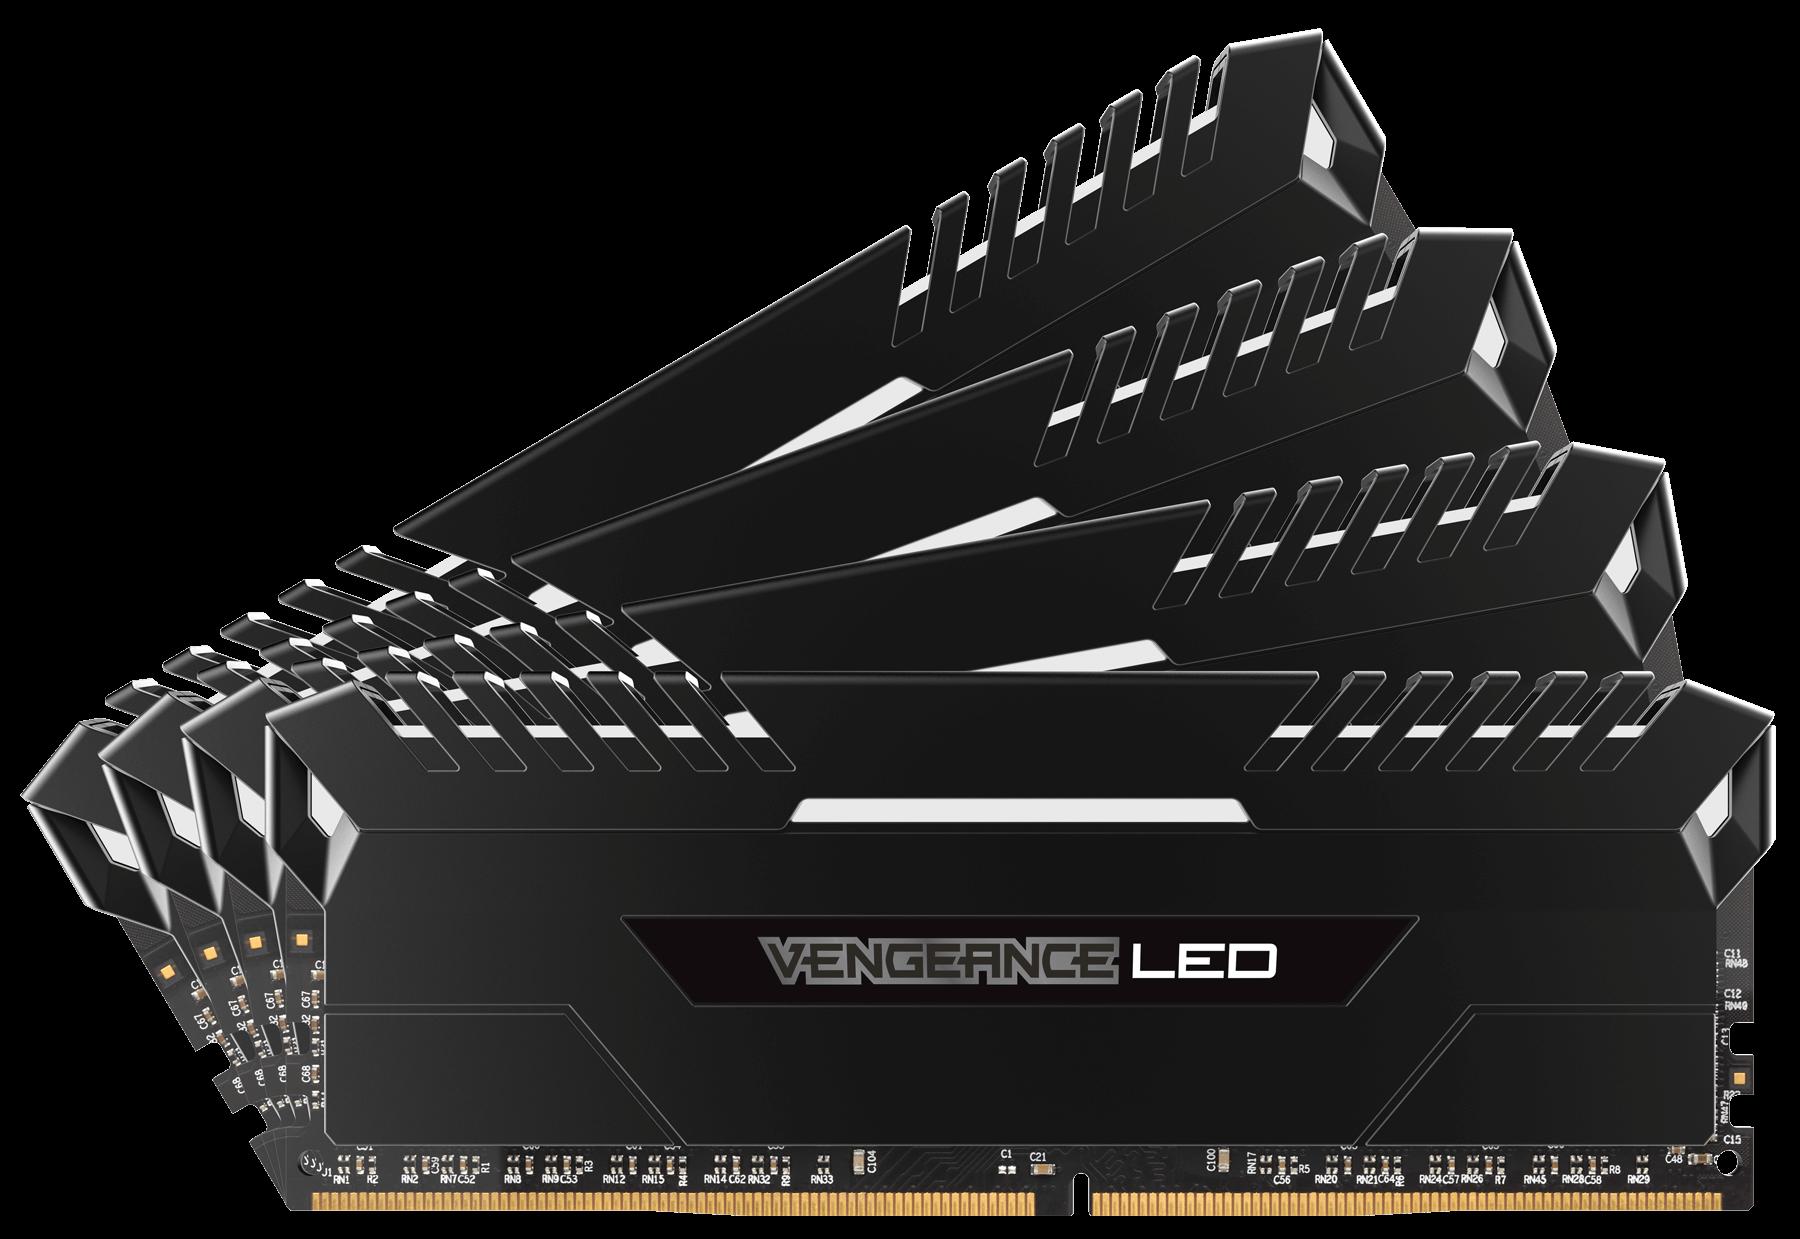 Corsair Vengeance LED 4x16GB DDR4 3200MHz 64GB